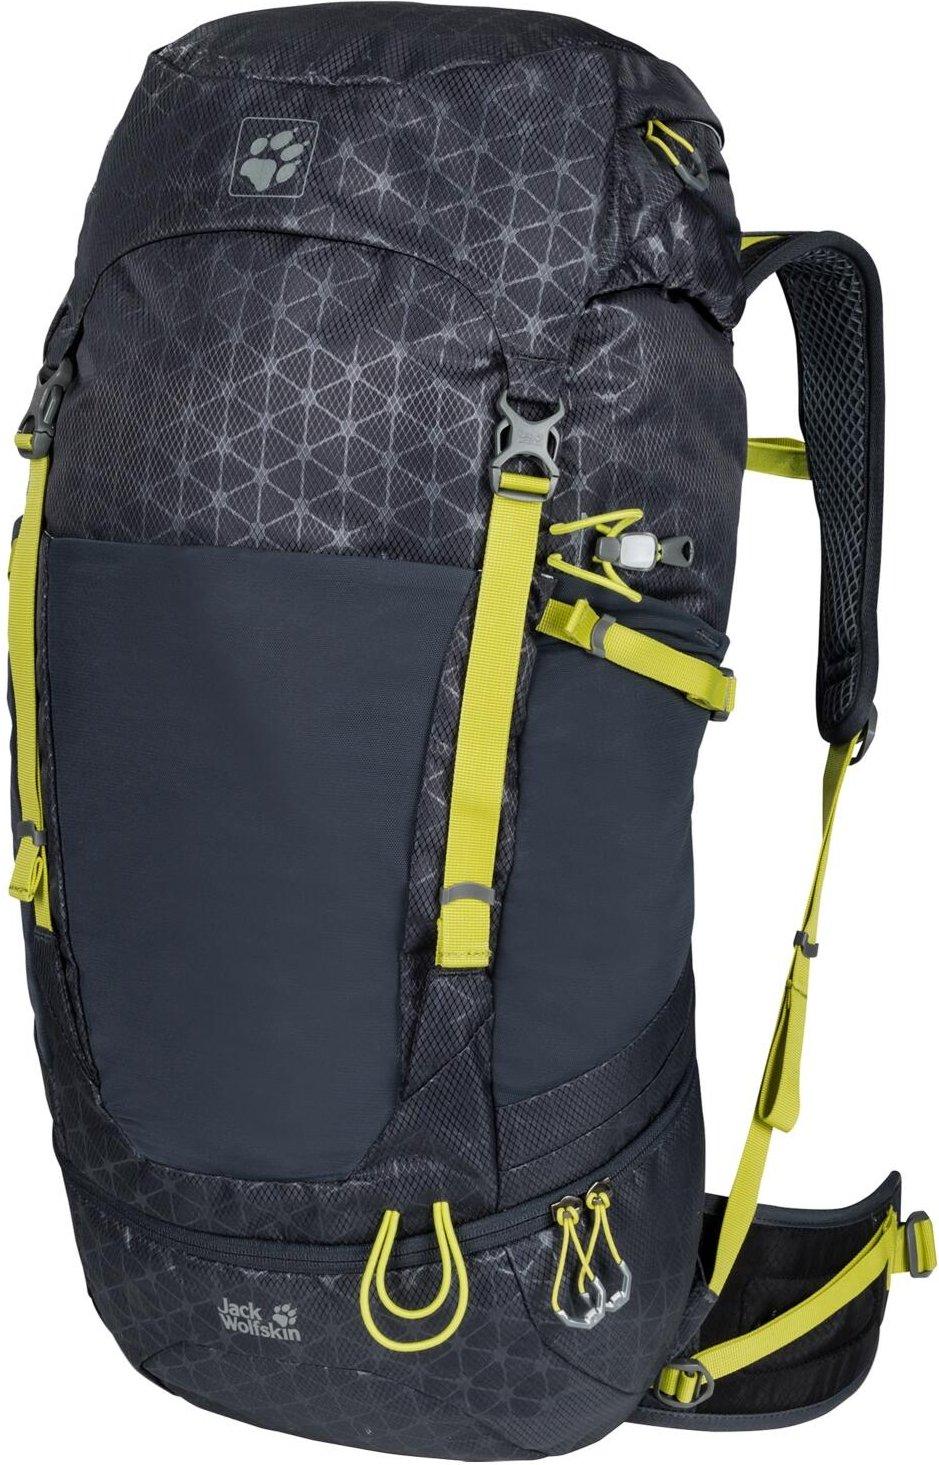 Jack Wolfskin Kalari Trail 42 Pack (Farbe: 8085 ebony grid)